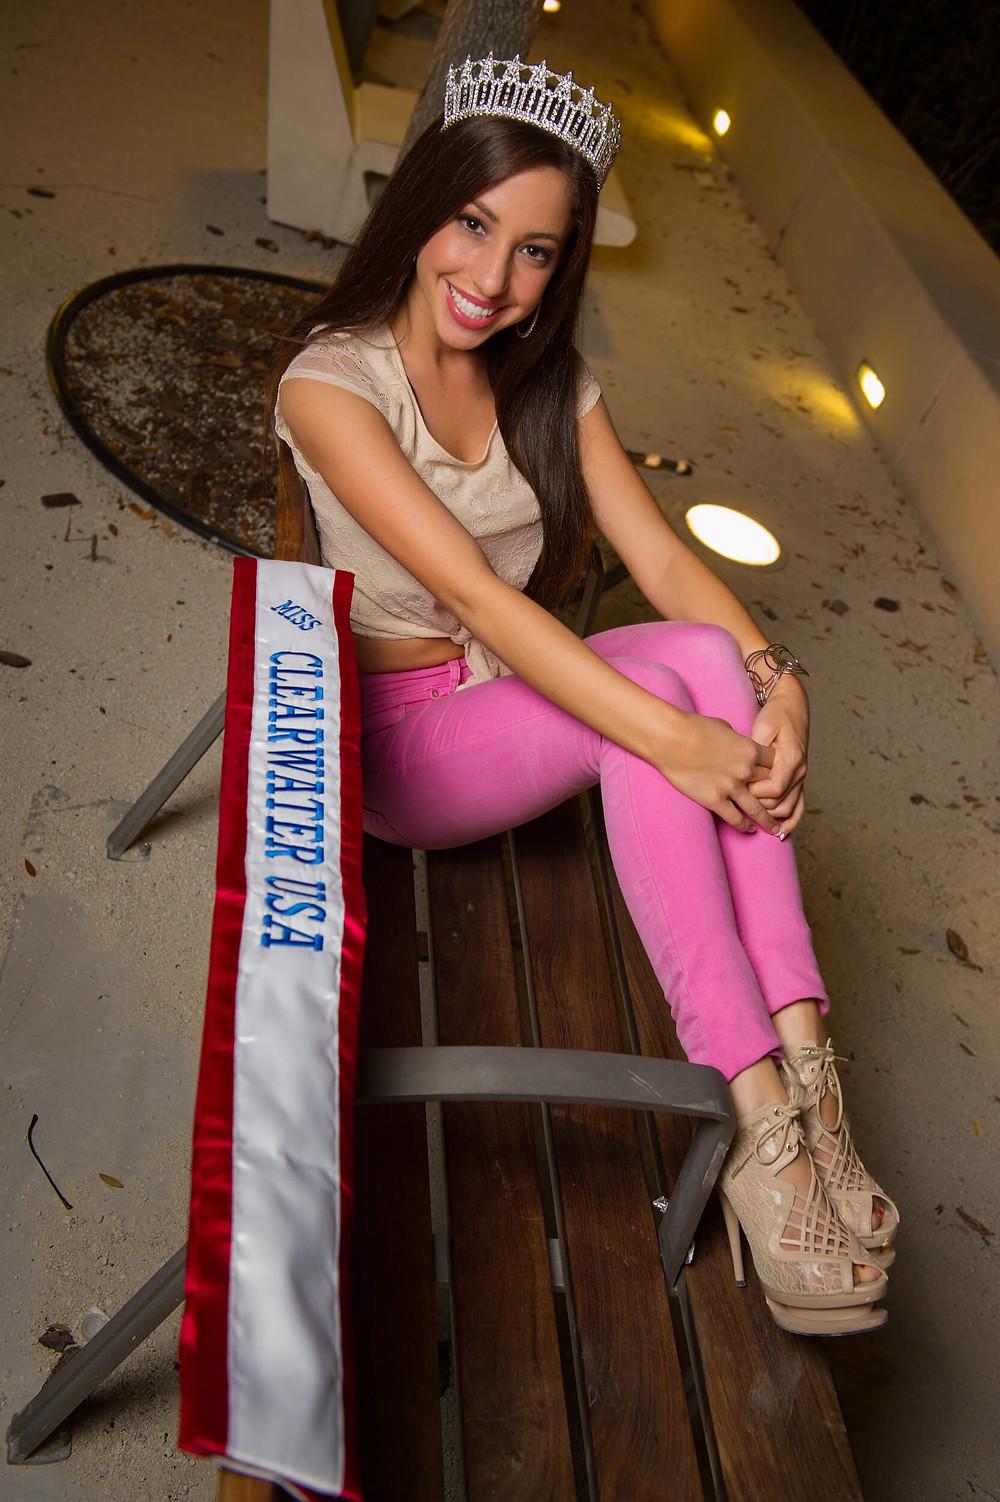 Cher Gopman Miss Clearwater 2013 2